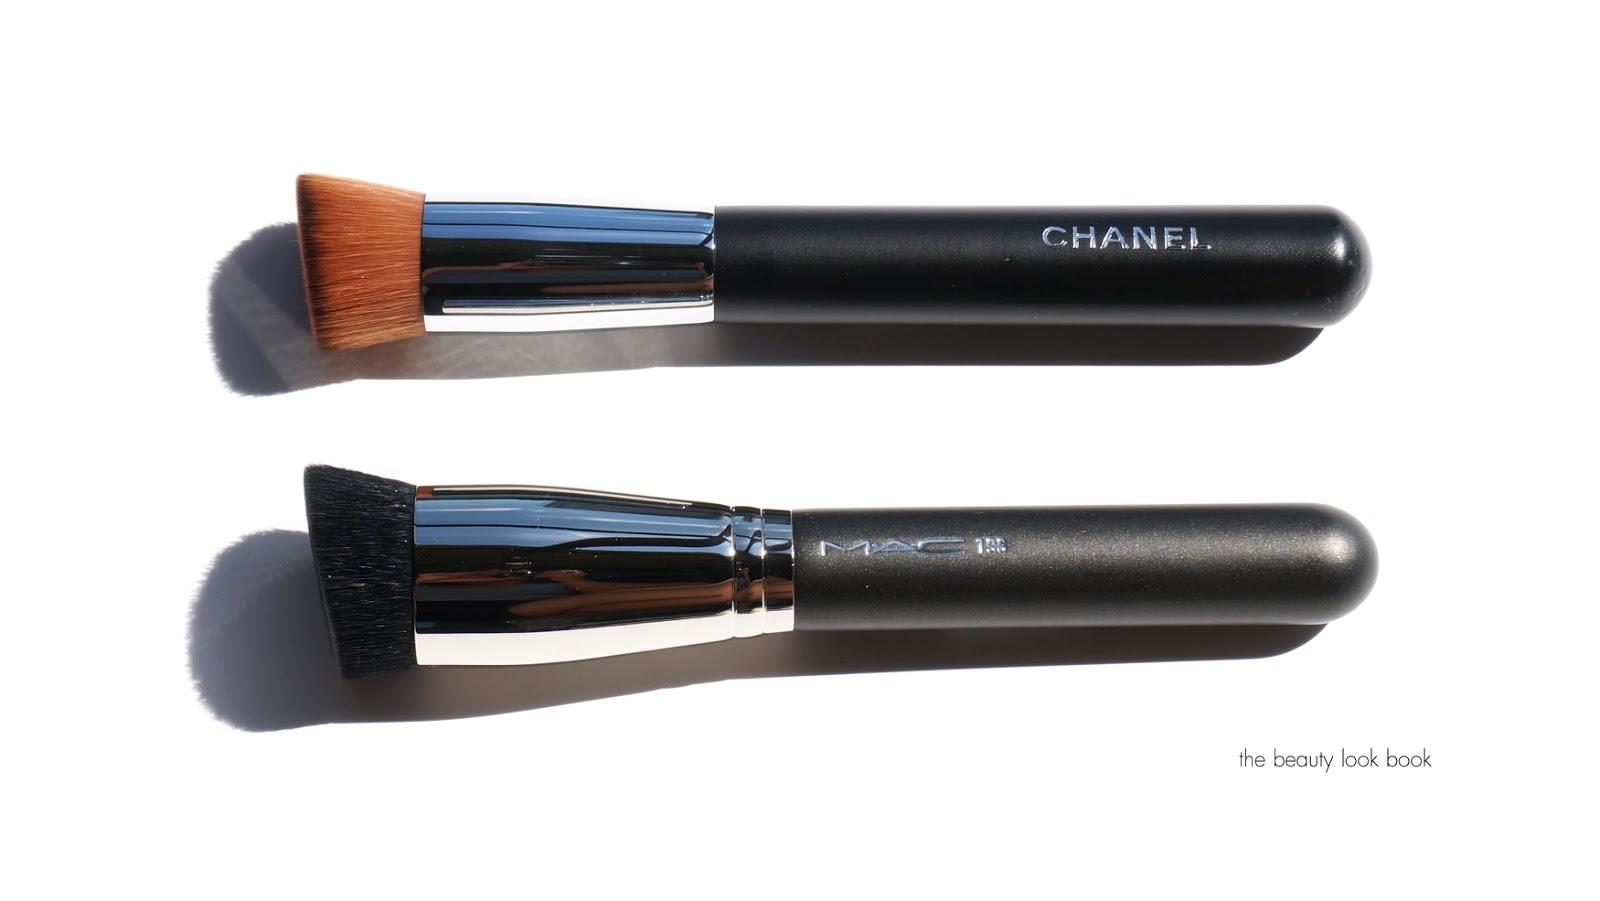 mac foundation brush reviews in Makeup Brushes - ChickAdvisor